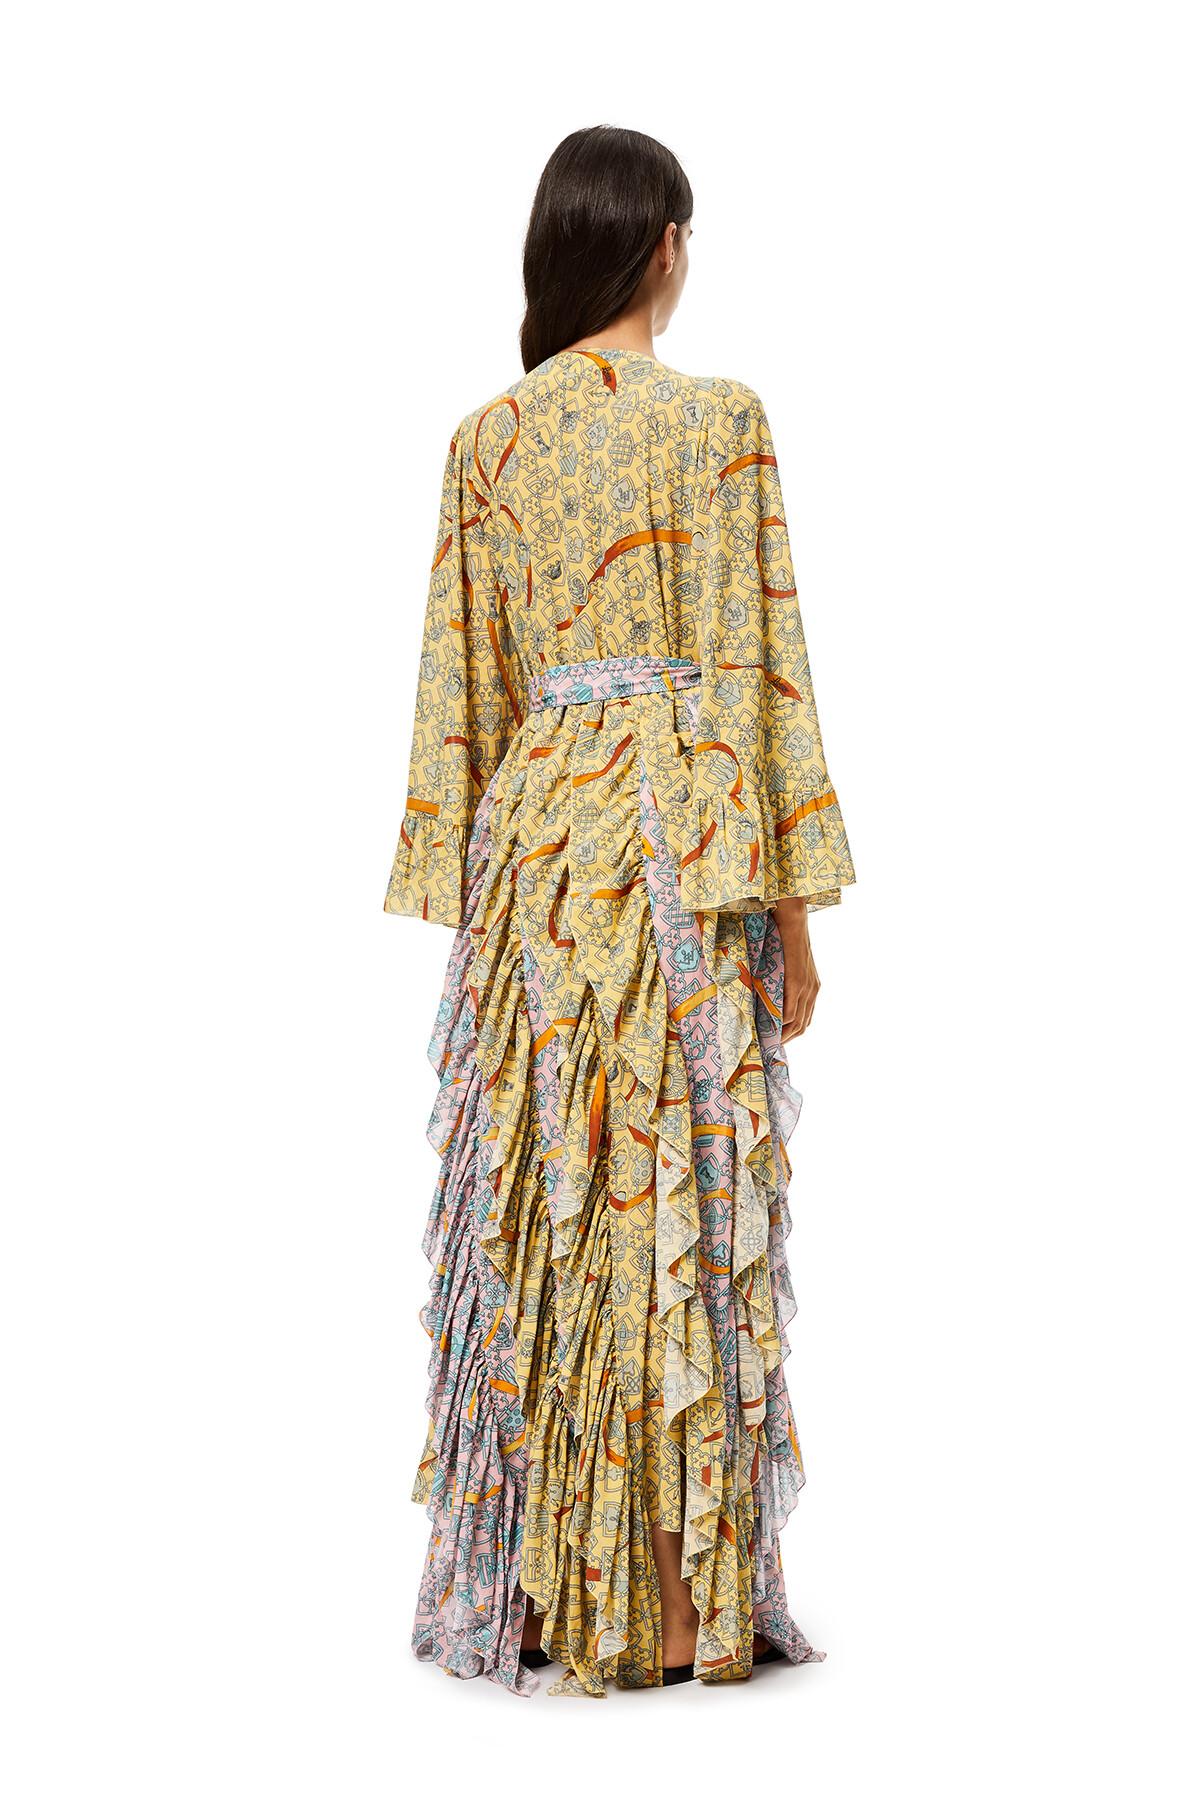 LOEWE Shield Bib And Ruffle Dress In Cotton Yellow/Pink front